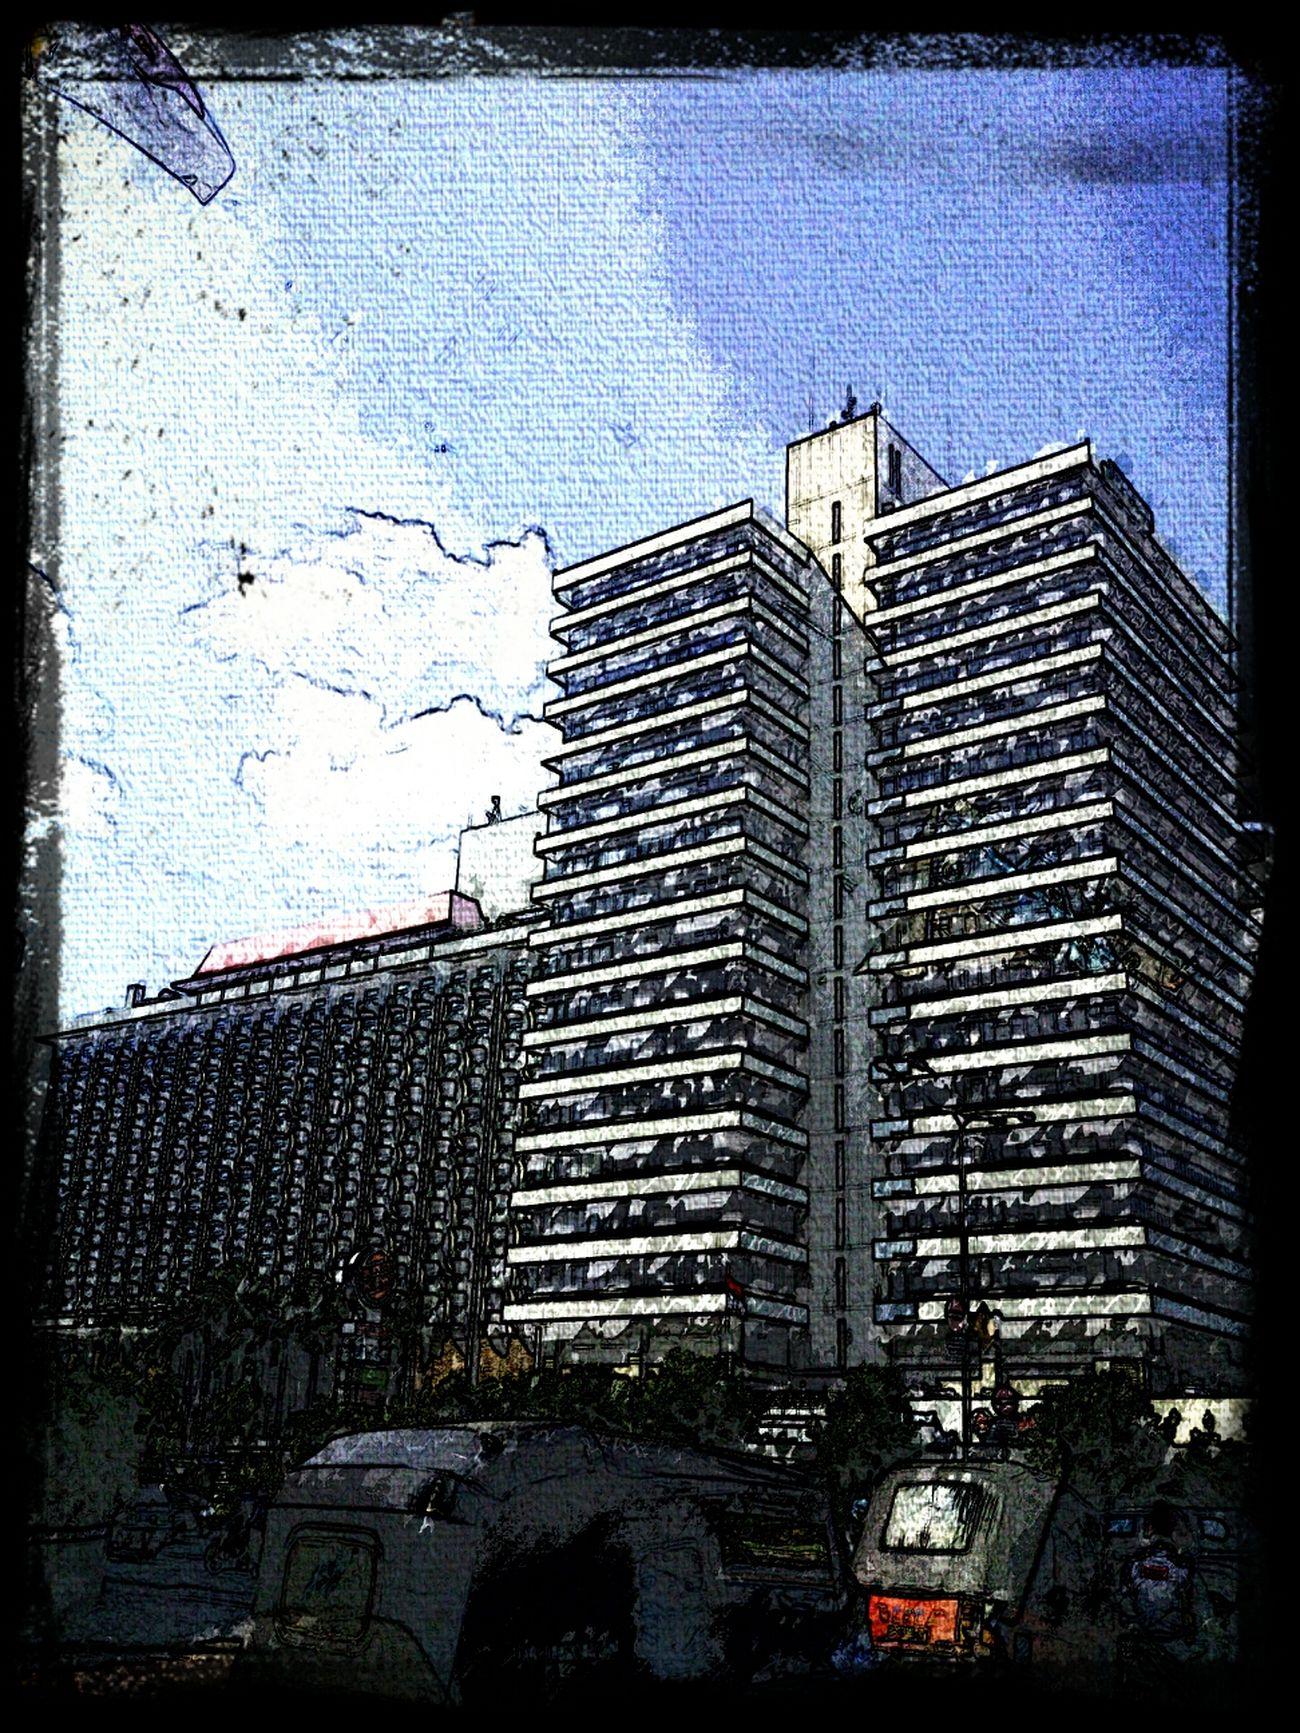 Sari Pan Pacific & Skyline Building on a sketch Sunset #sun #clouds #skylovers #sky #nature #beautifulinnature #naturalbeauty #photography #landscape Instagood, #tweegram #photooftheday #sketch,#sketchclub,#malen,#painting,#instagram,#picoftheday,#art,#star,#followme,#follo Streetphotography